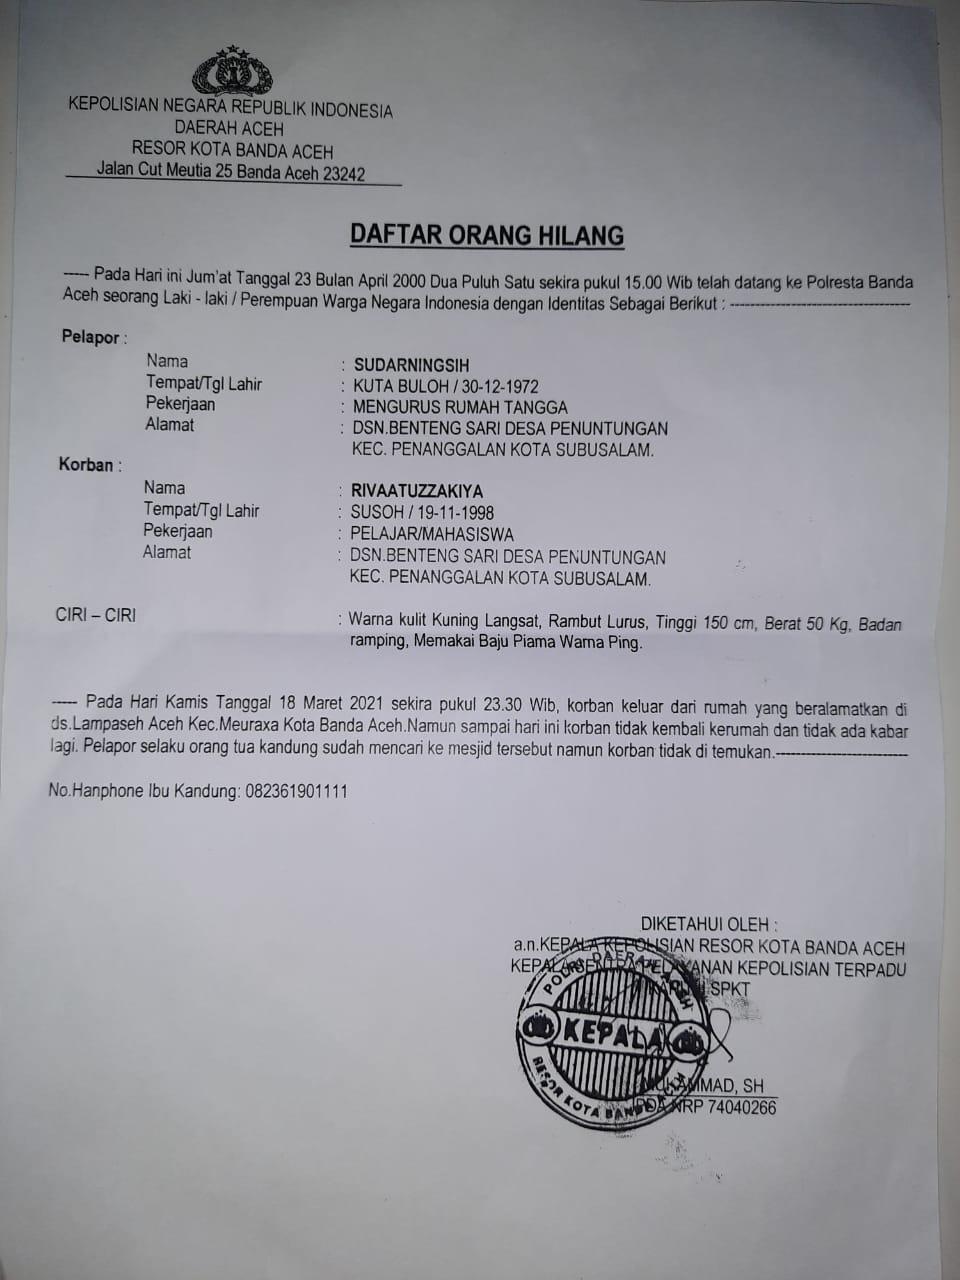 salinan Daftar Orang Hilang yang dikeluarkan Polresta Banda Aceh dan diterima Serambinews.com dari keluarga korban, Senin (26/4/2021)